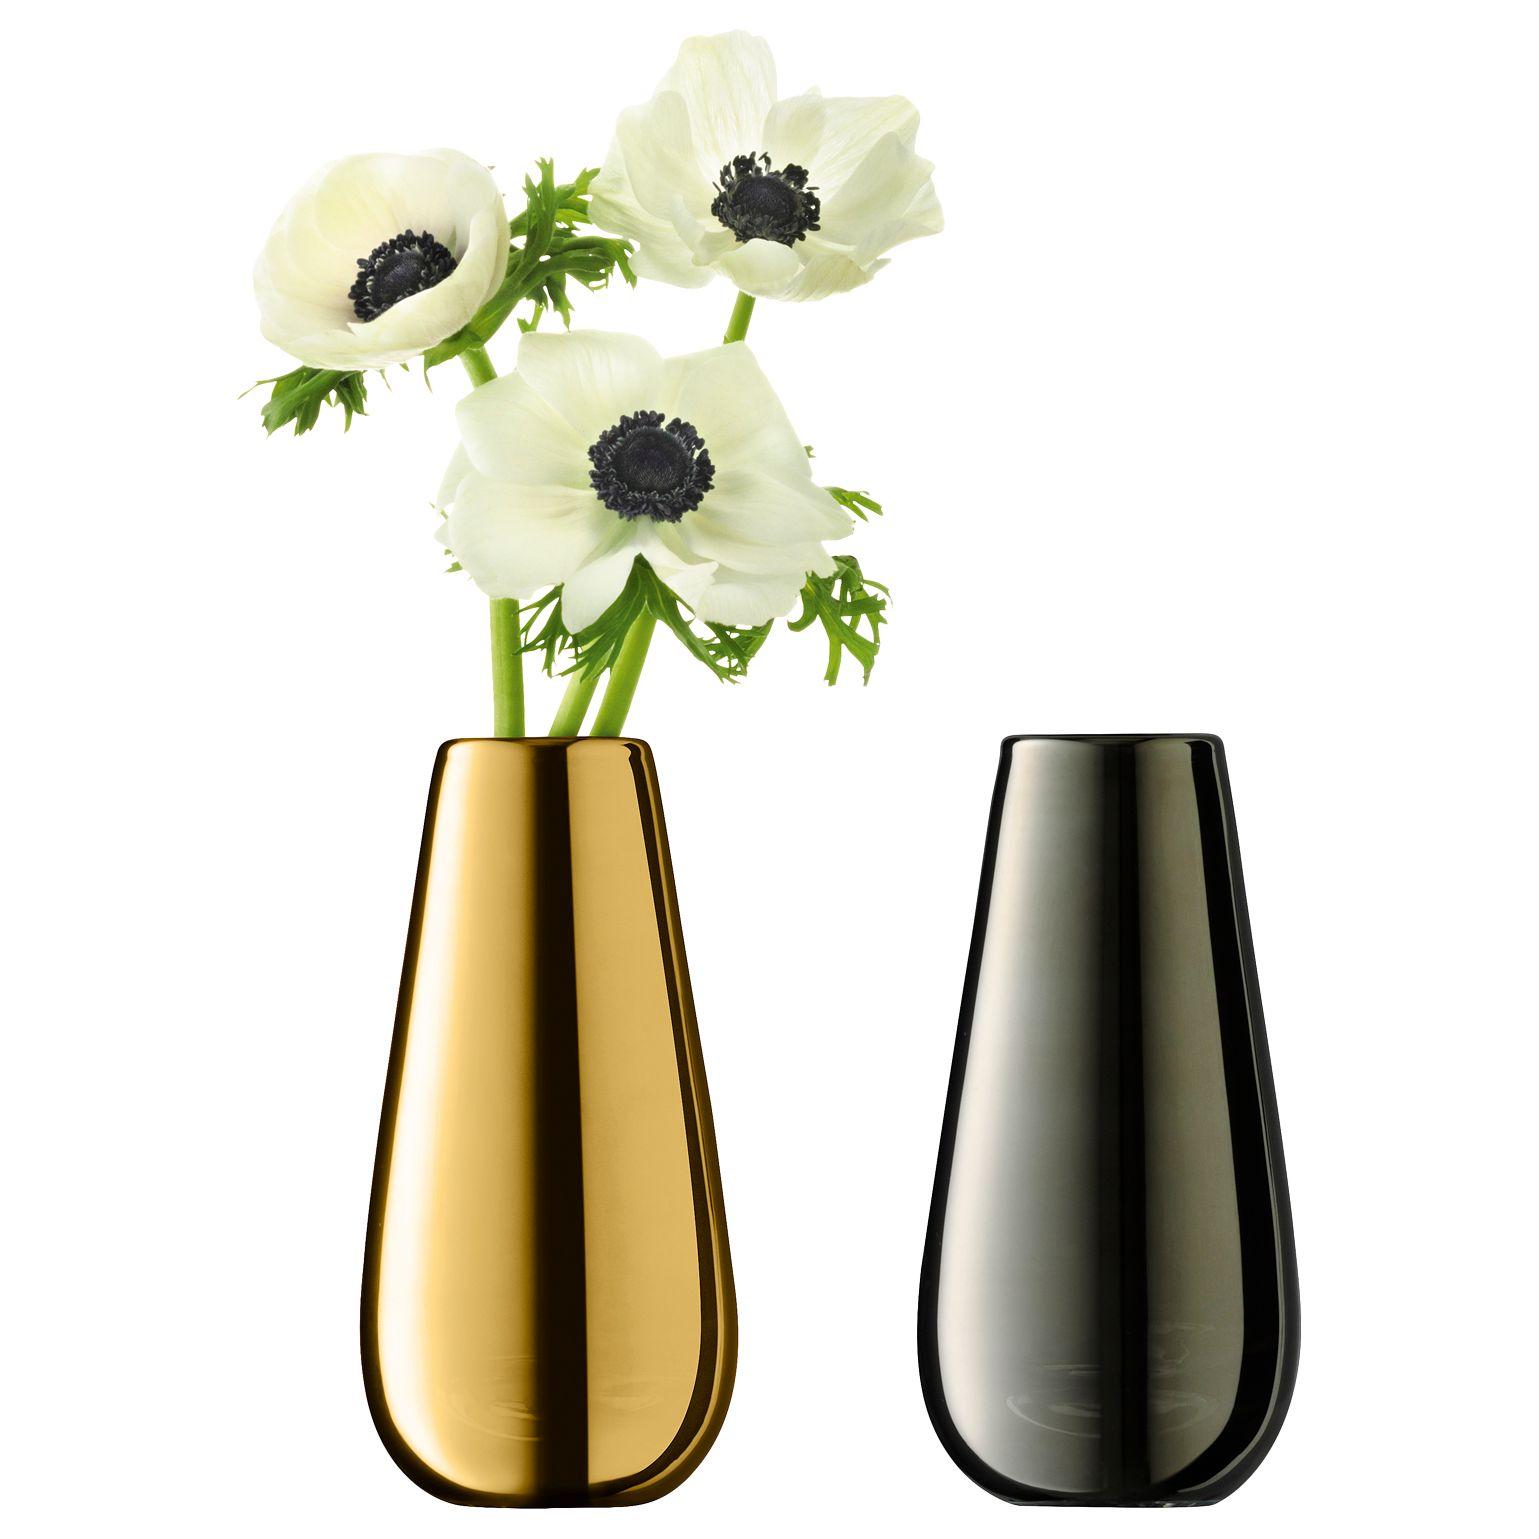 Lsa international flower metallic bud vase duo bluewater 3800 reviewsmspy